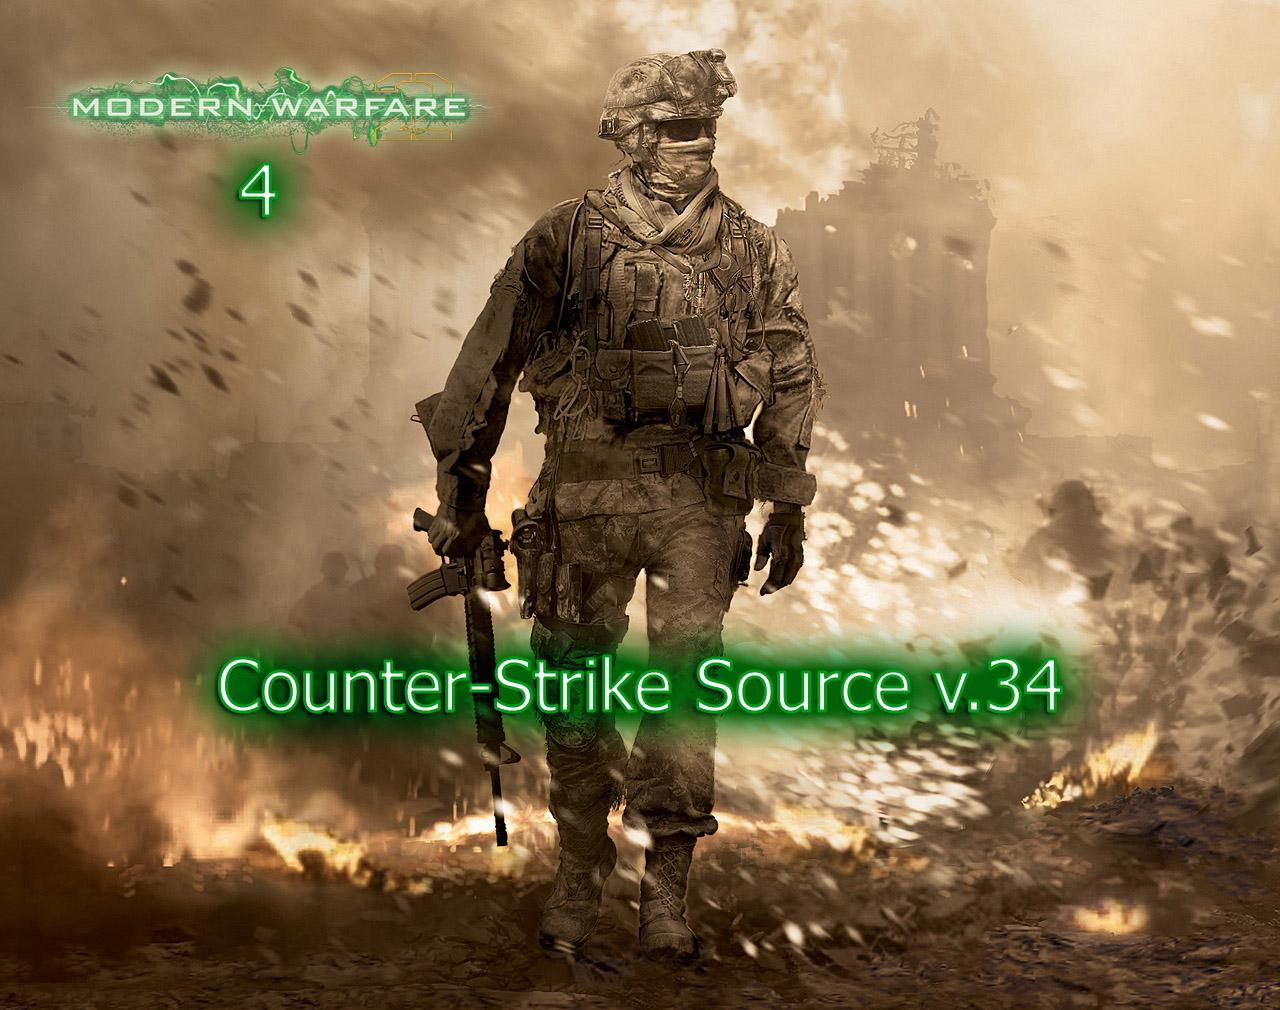 cs 1.6 mw2 download